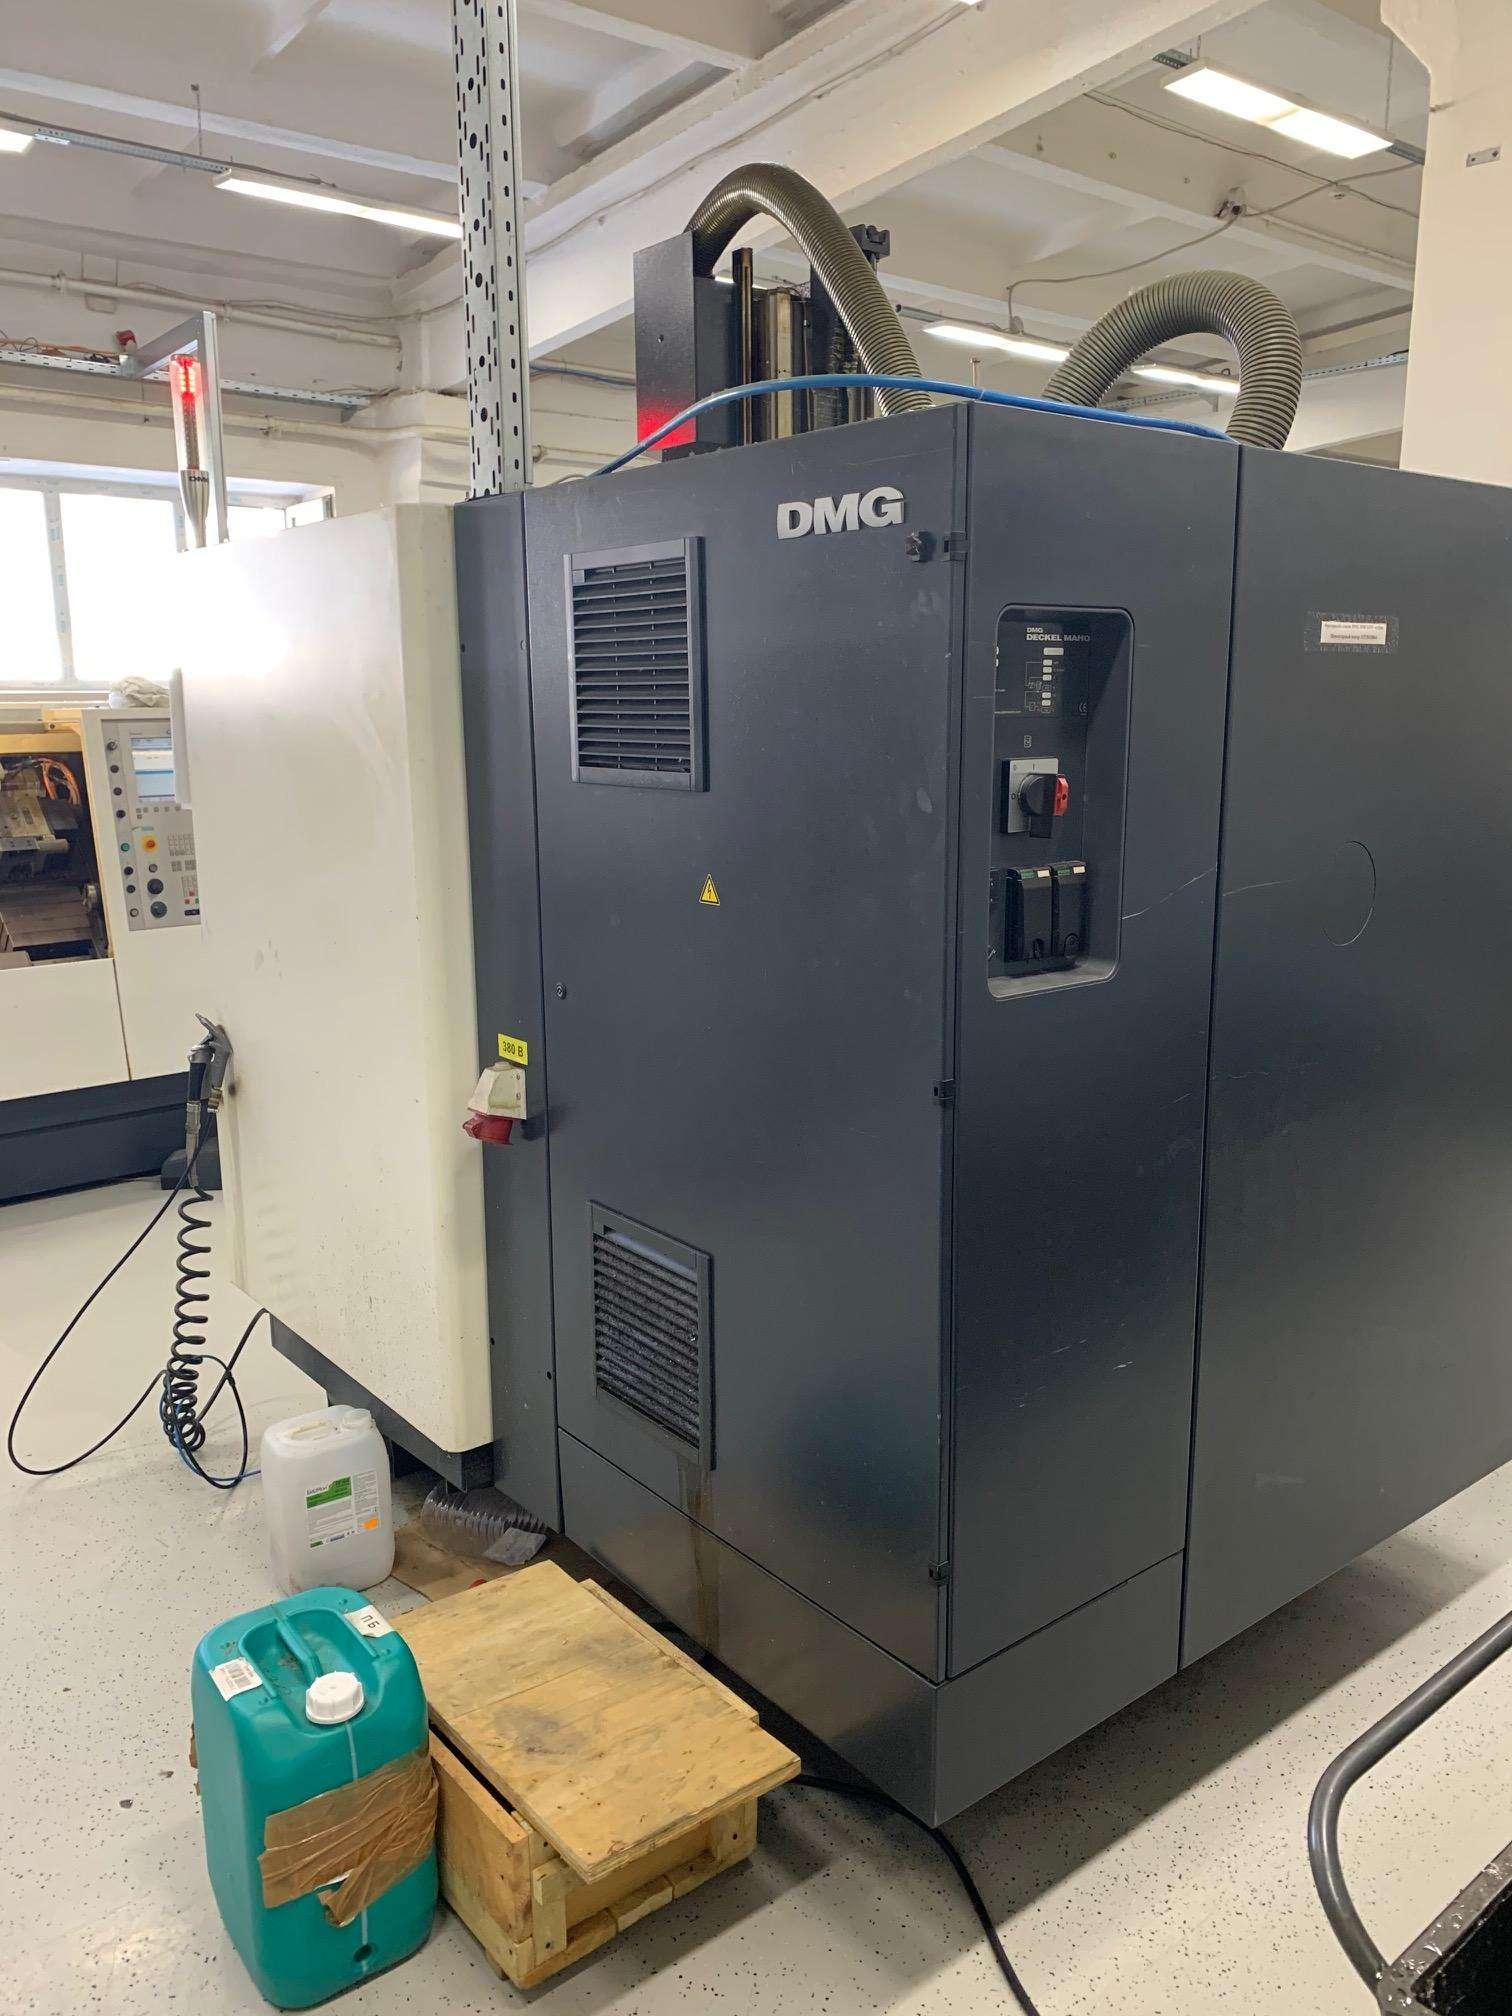 Bearbeitungszentrum - Vertikal DMG Mori DMC 635 ecoline Bilder auf Industry-Pilot